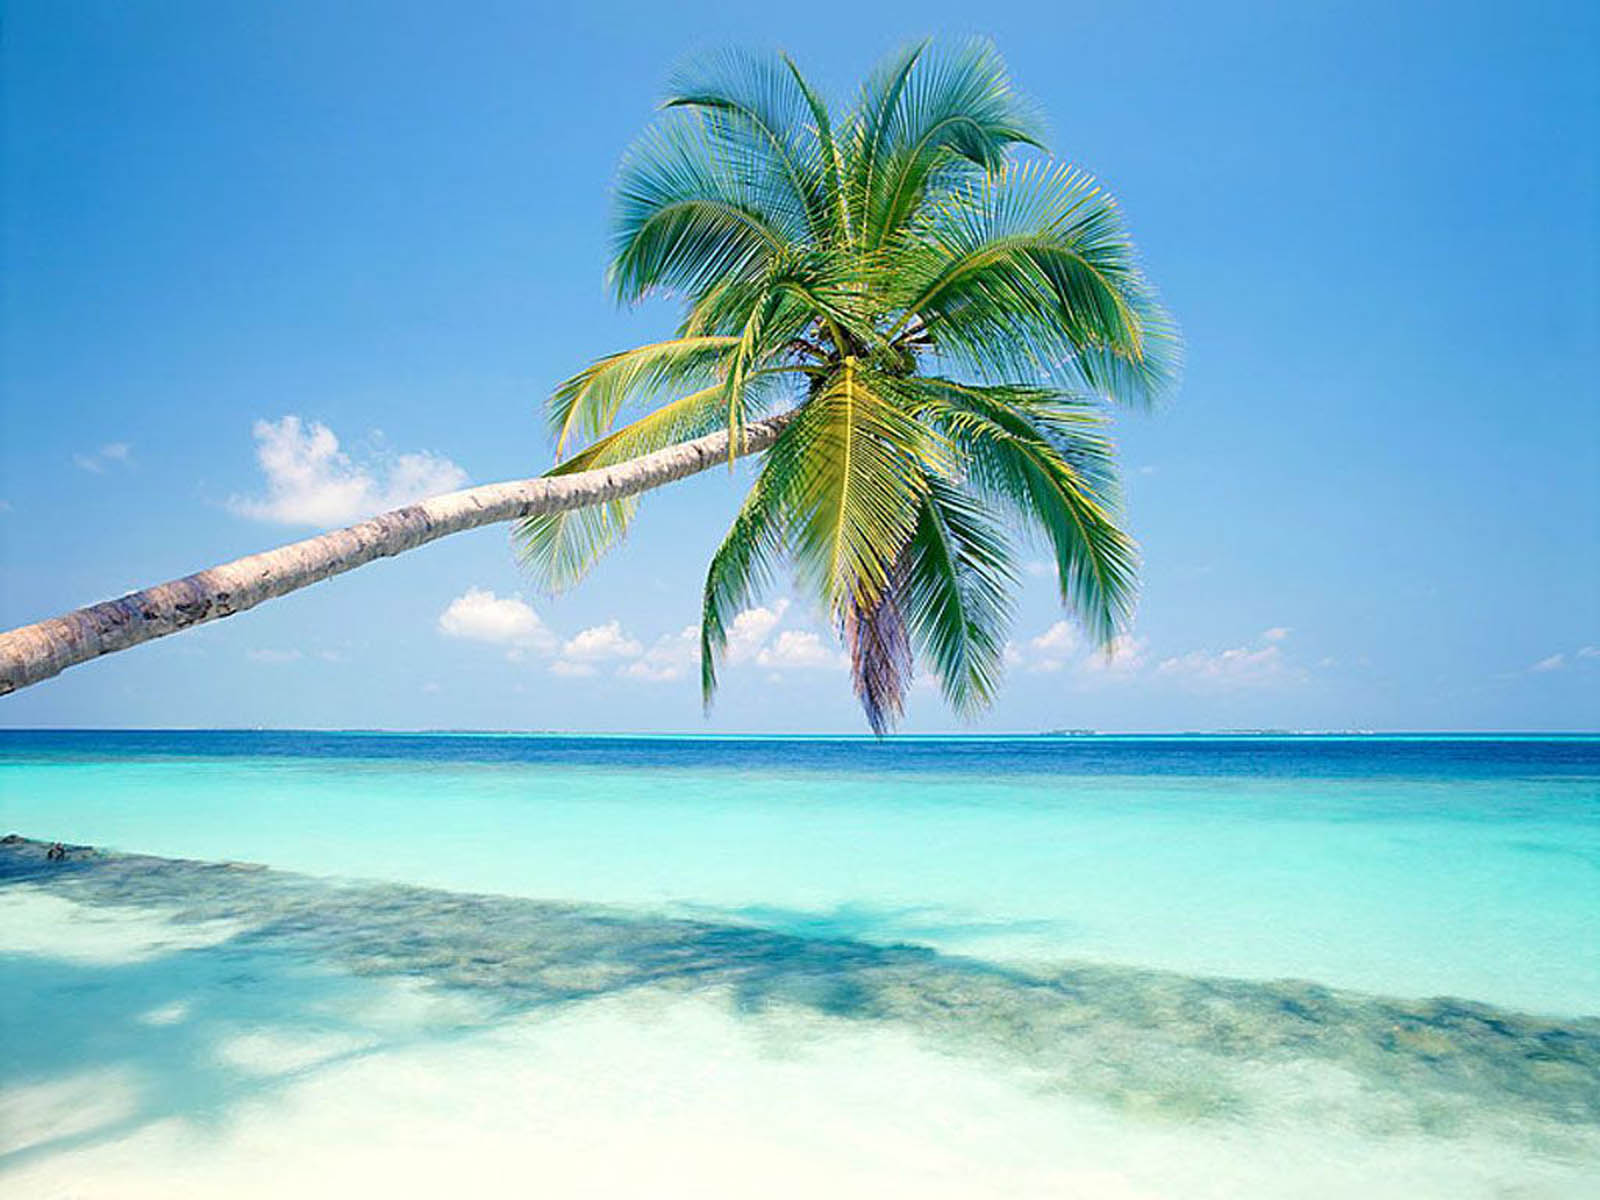 Beach, Sky, Palm Trees Wallpaper Background - Tropical Island Wallpaper Hd - HD Wallpaper